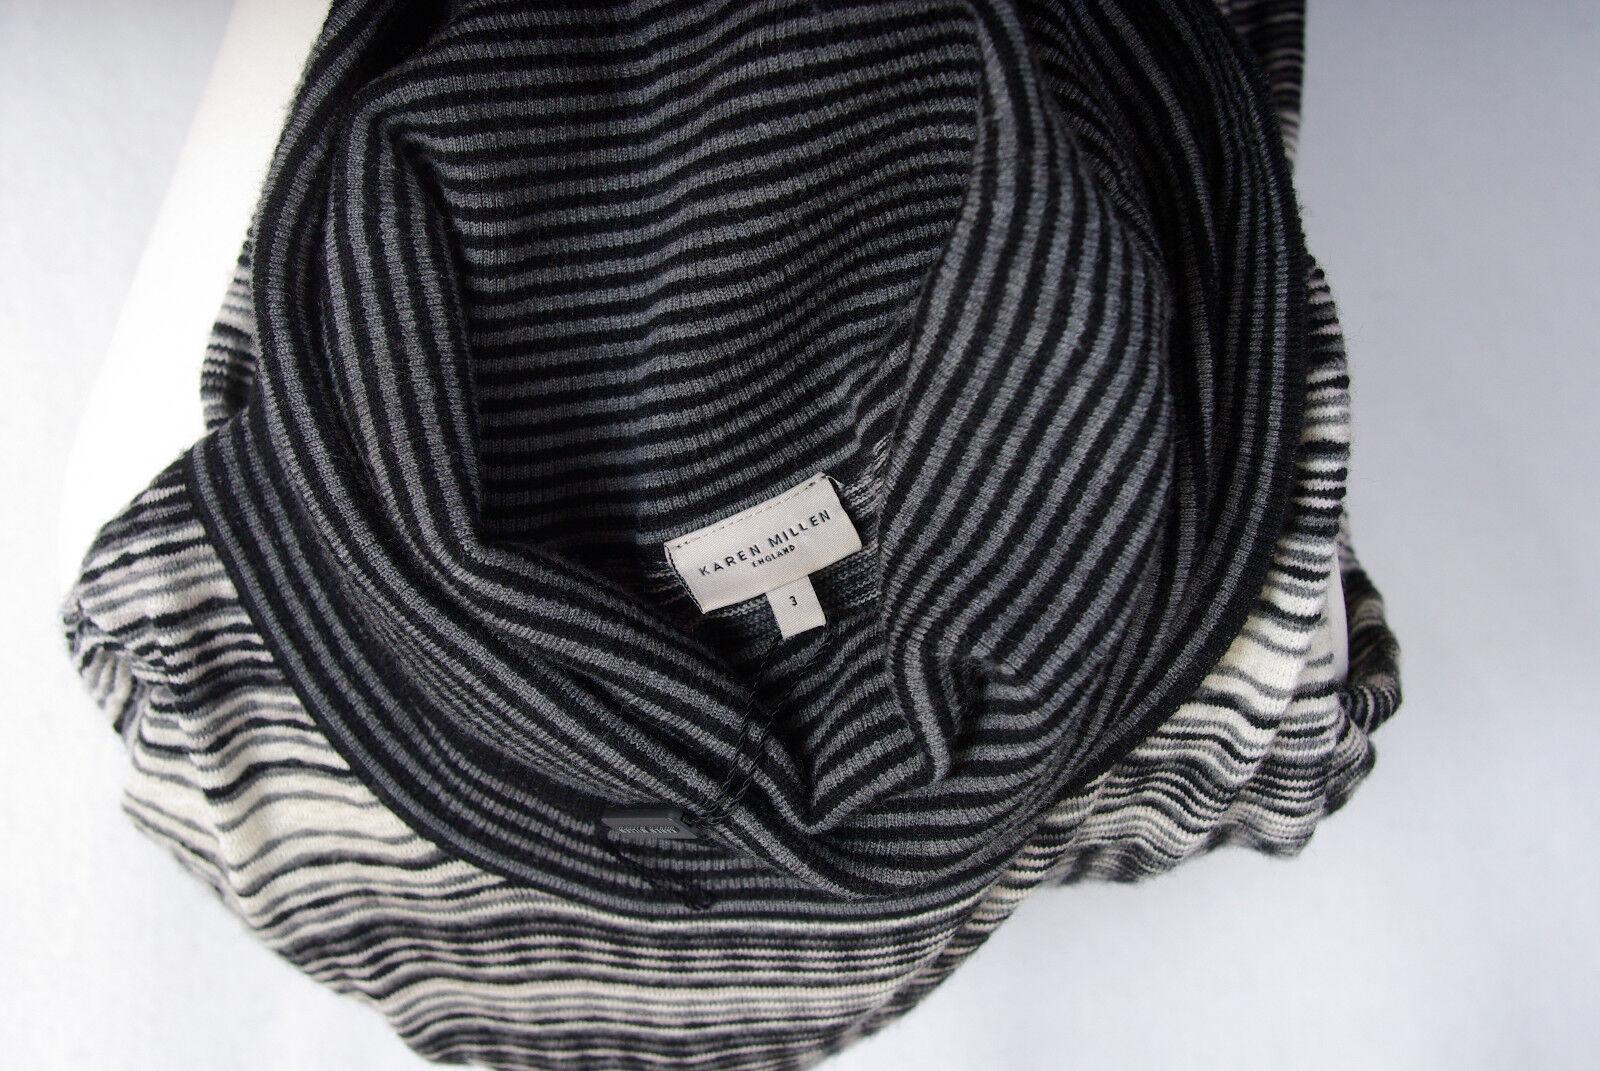 P417 21 Karen Millen Melange Grey Grey Grey Merino Wool Sexy Fitted Jumper Dress, size 3 6e4910